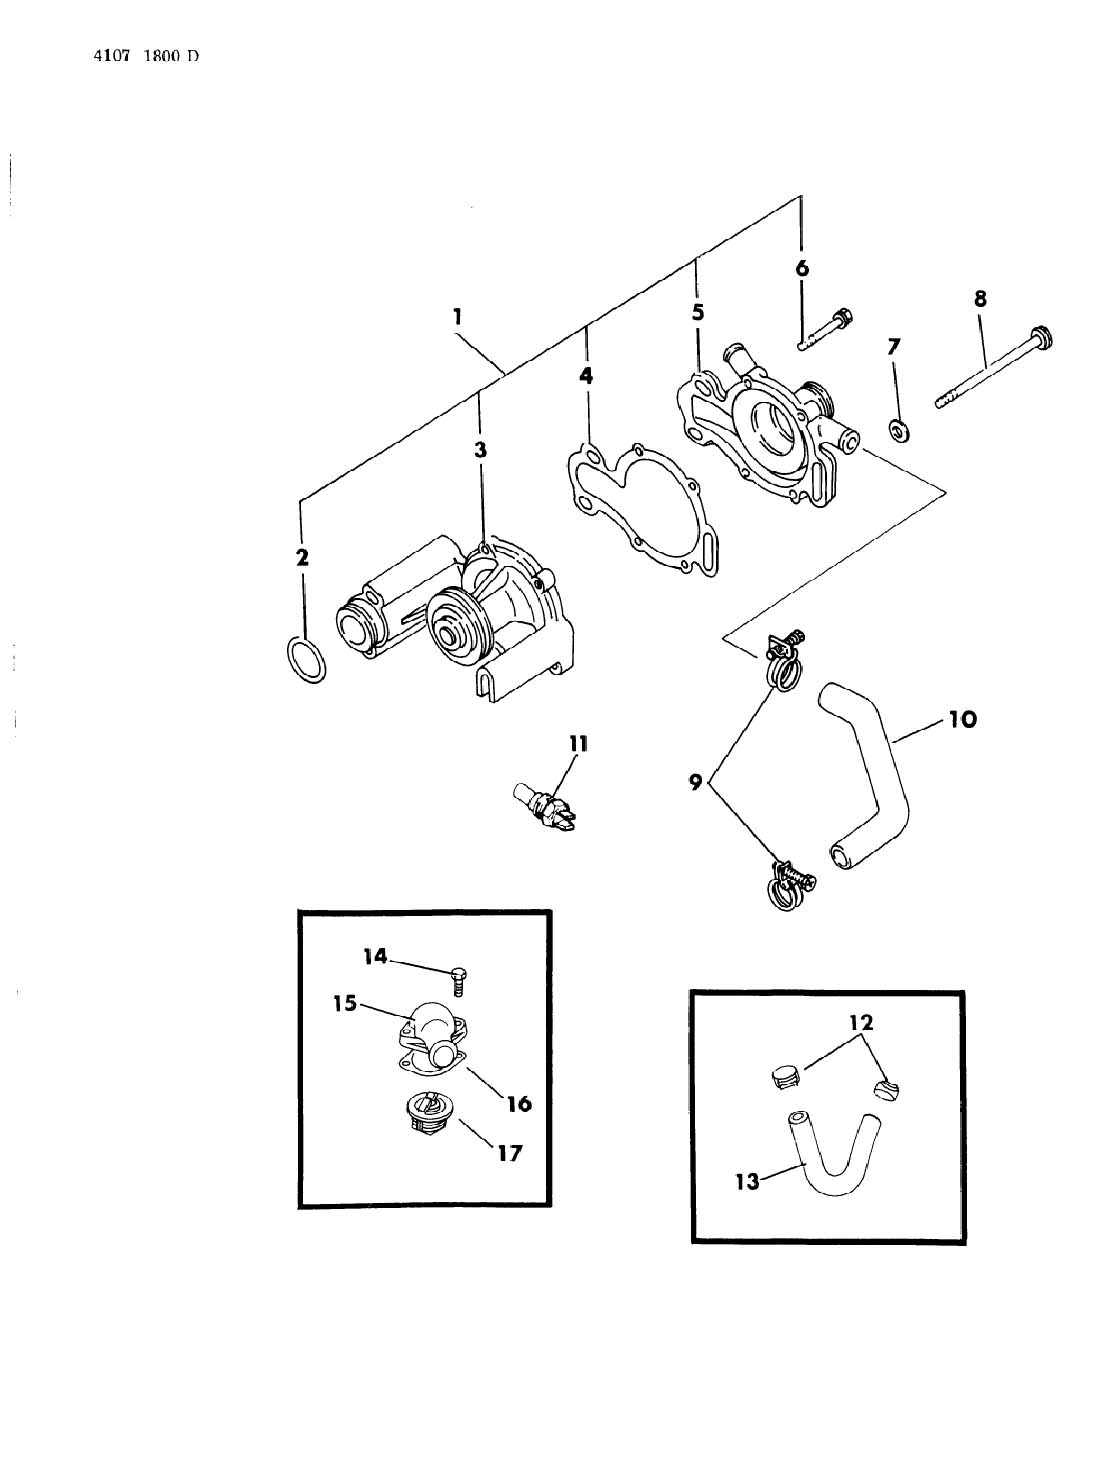 Chrysler Lebaron Fuse Diagram Wiring Diagrams